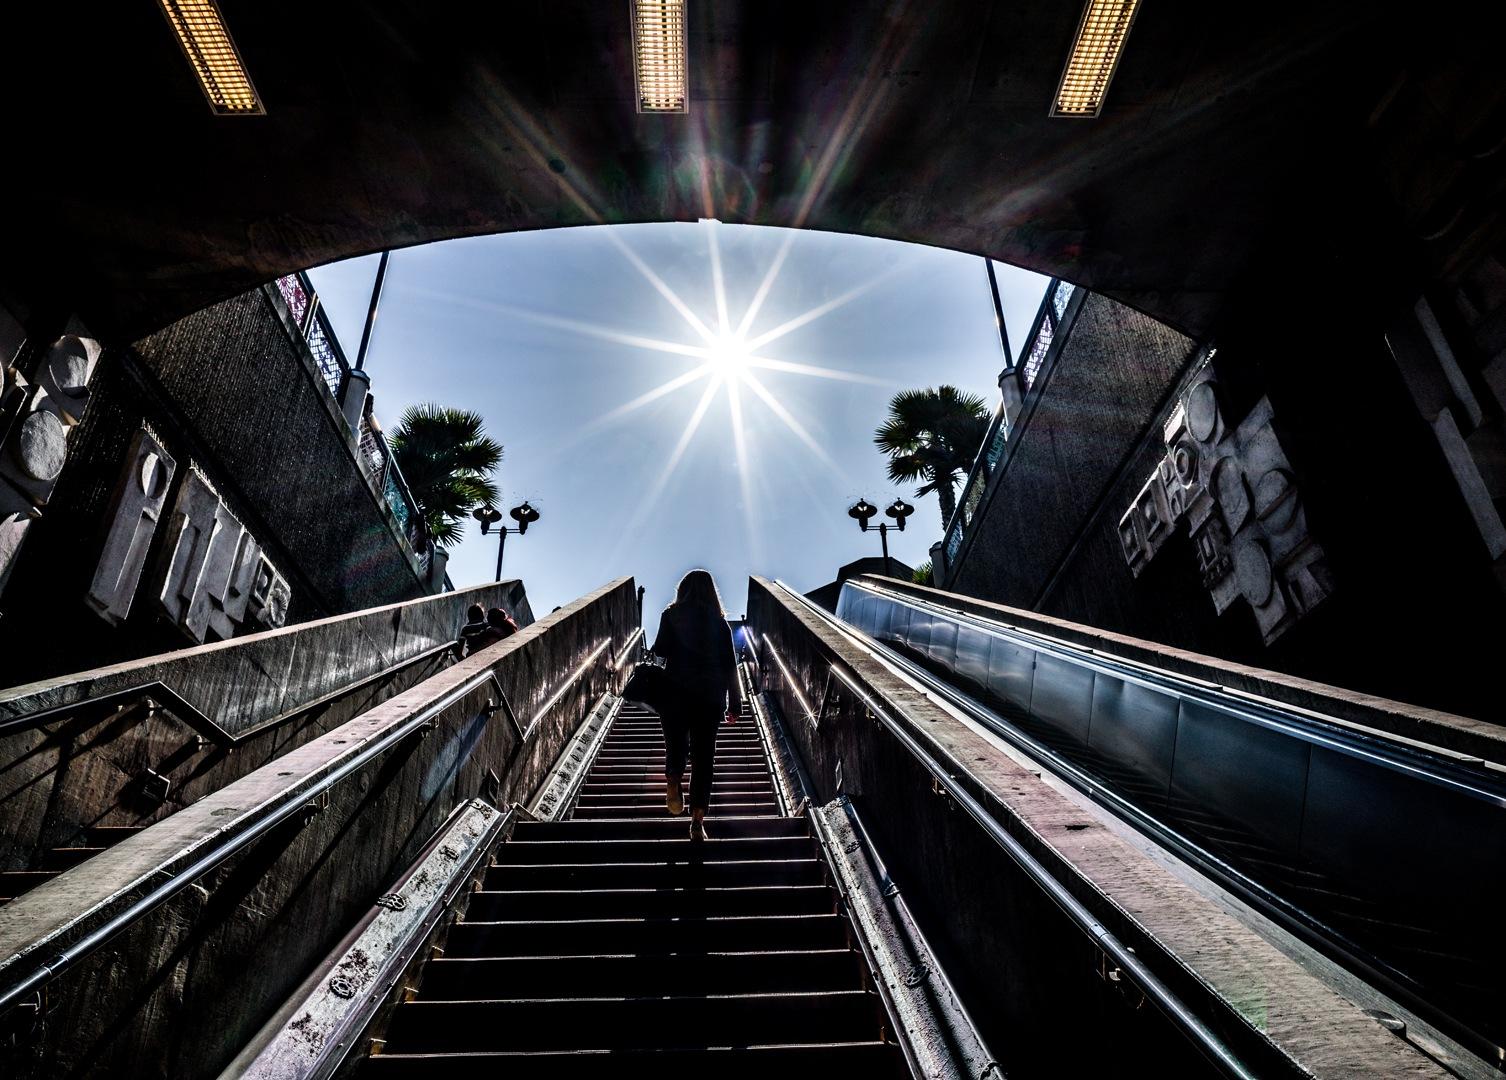 Life / SF 1386 by HowardL